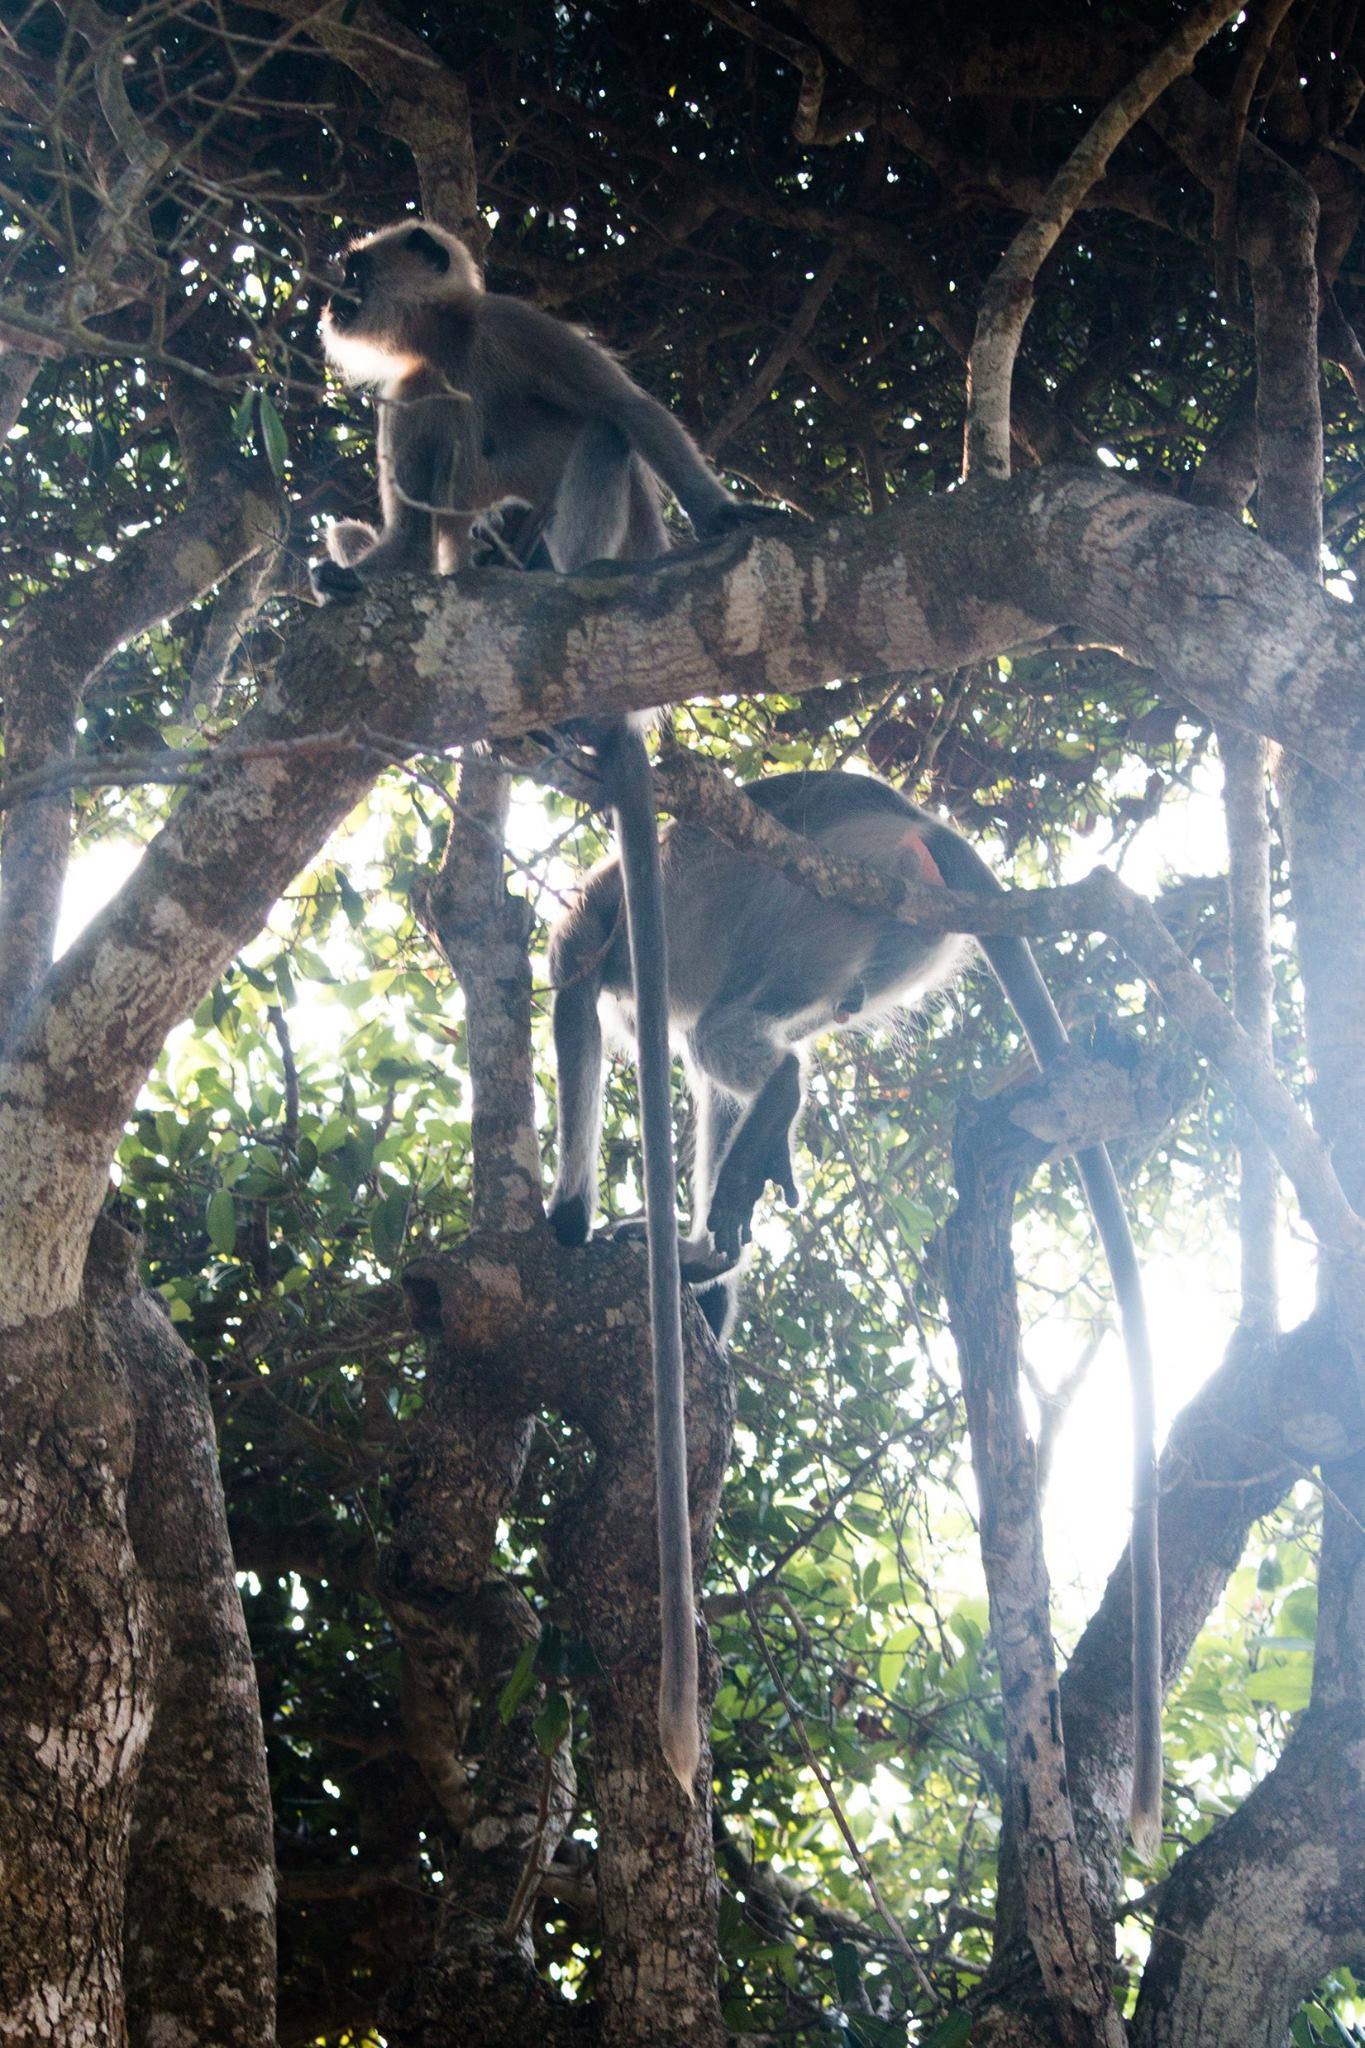 invite-to-paradise-sri-lanka-and-maldives-specialists-travel-agent-tour-operator-customer-review--feedback-joel-rhian-monkey-10.jpg